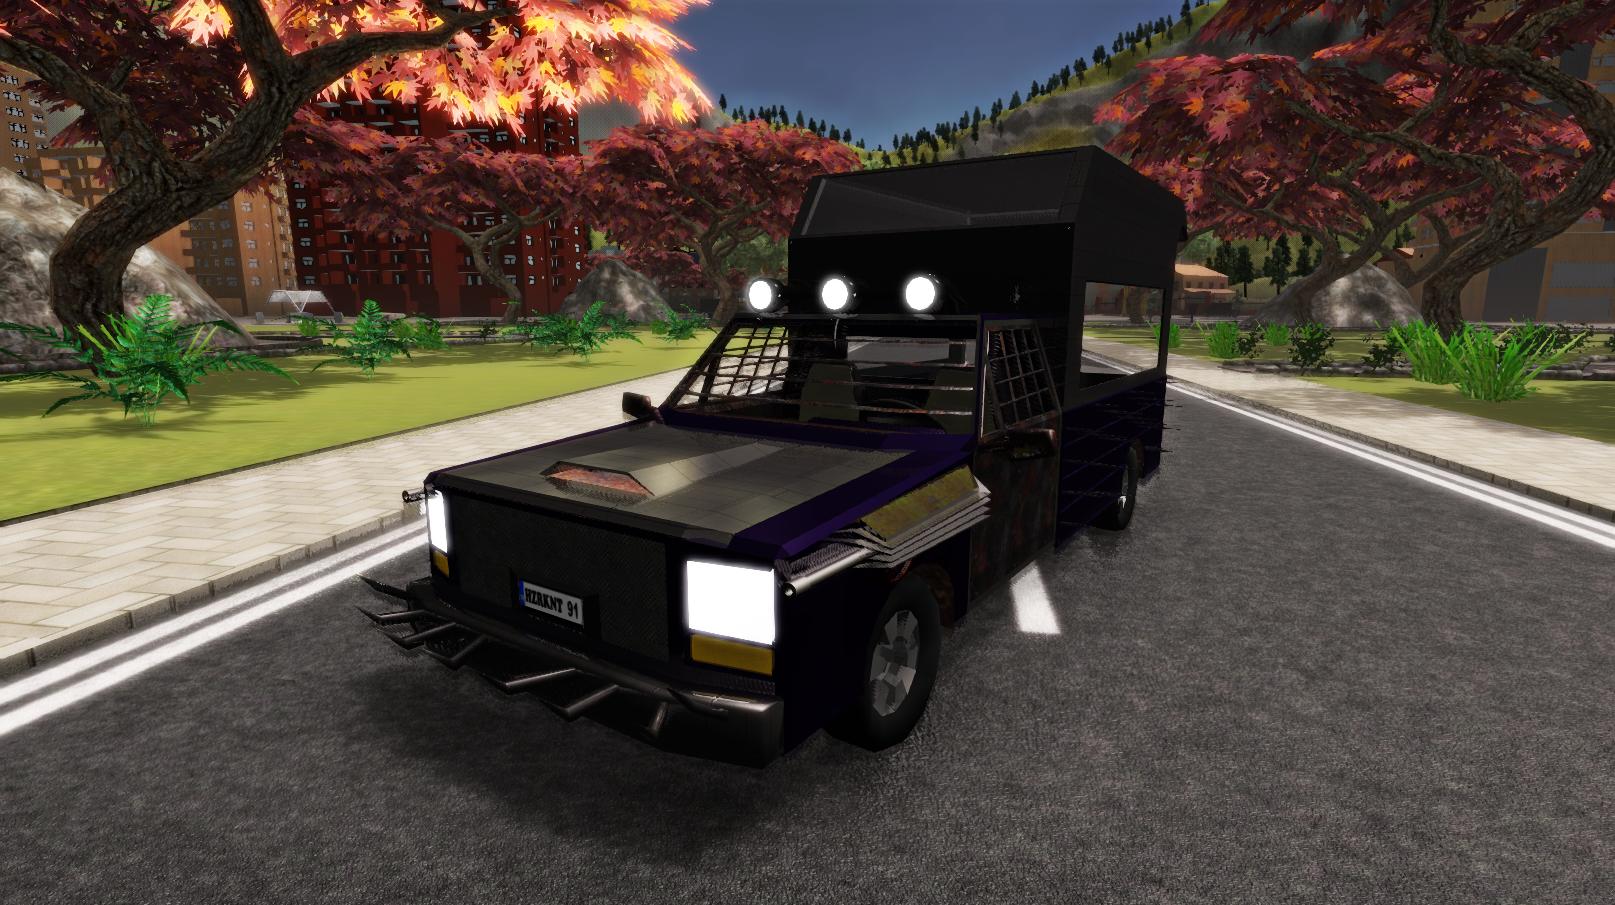 Vehicle 3